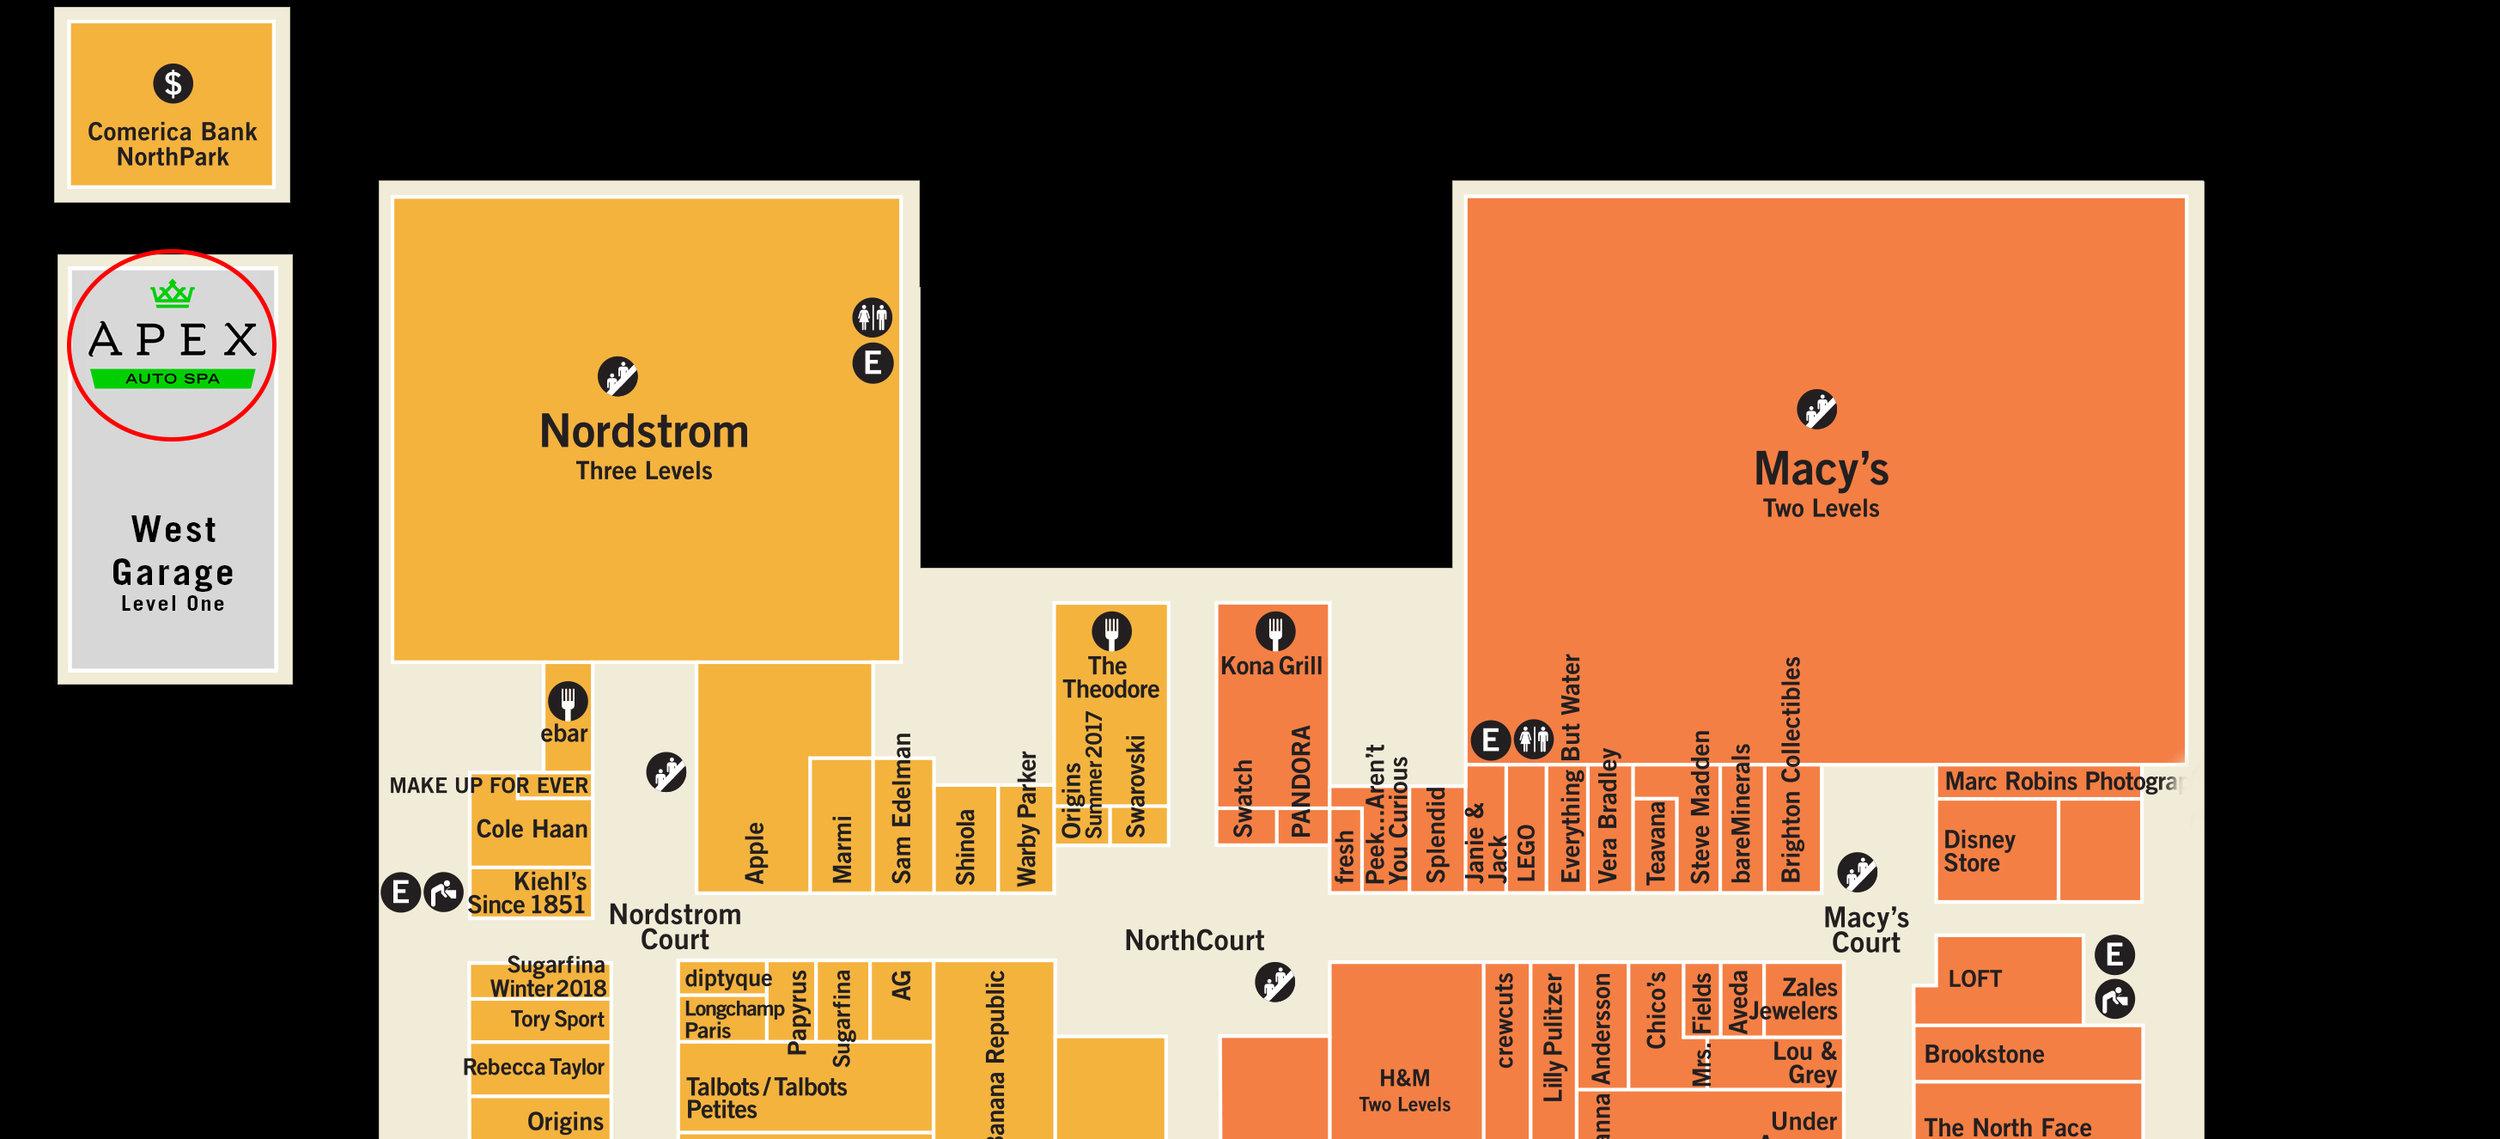 NorthPark_Center_Map_AUG17-1.jpg